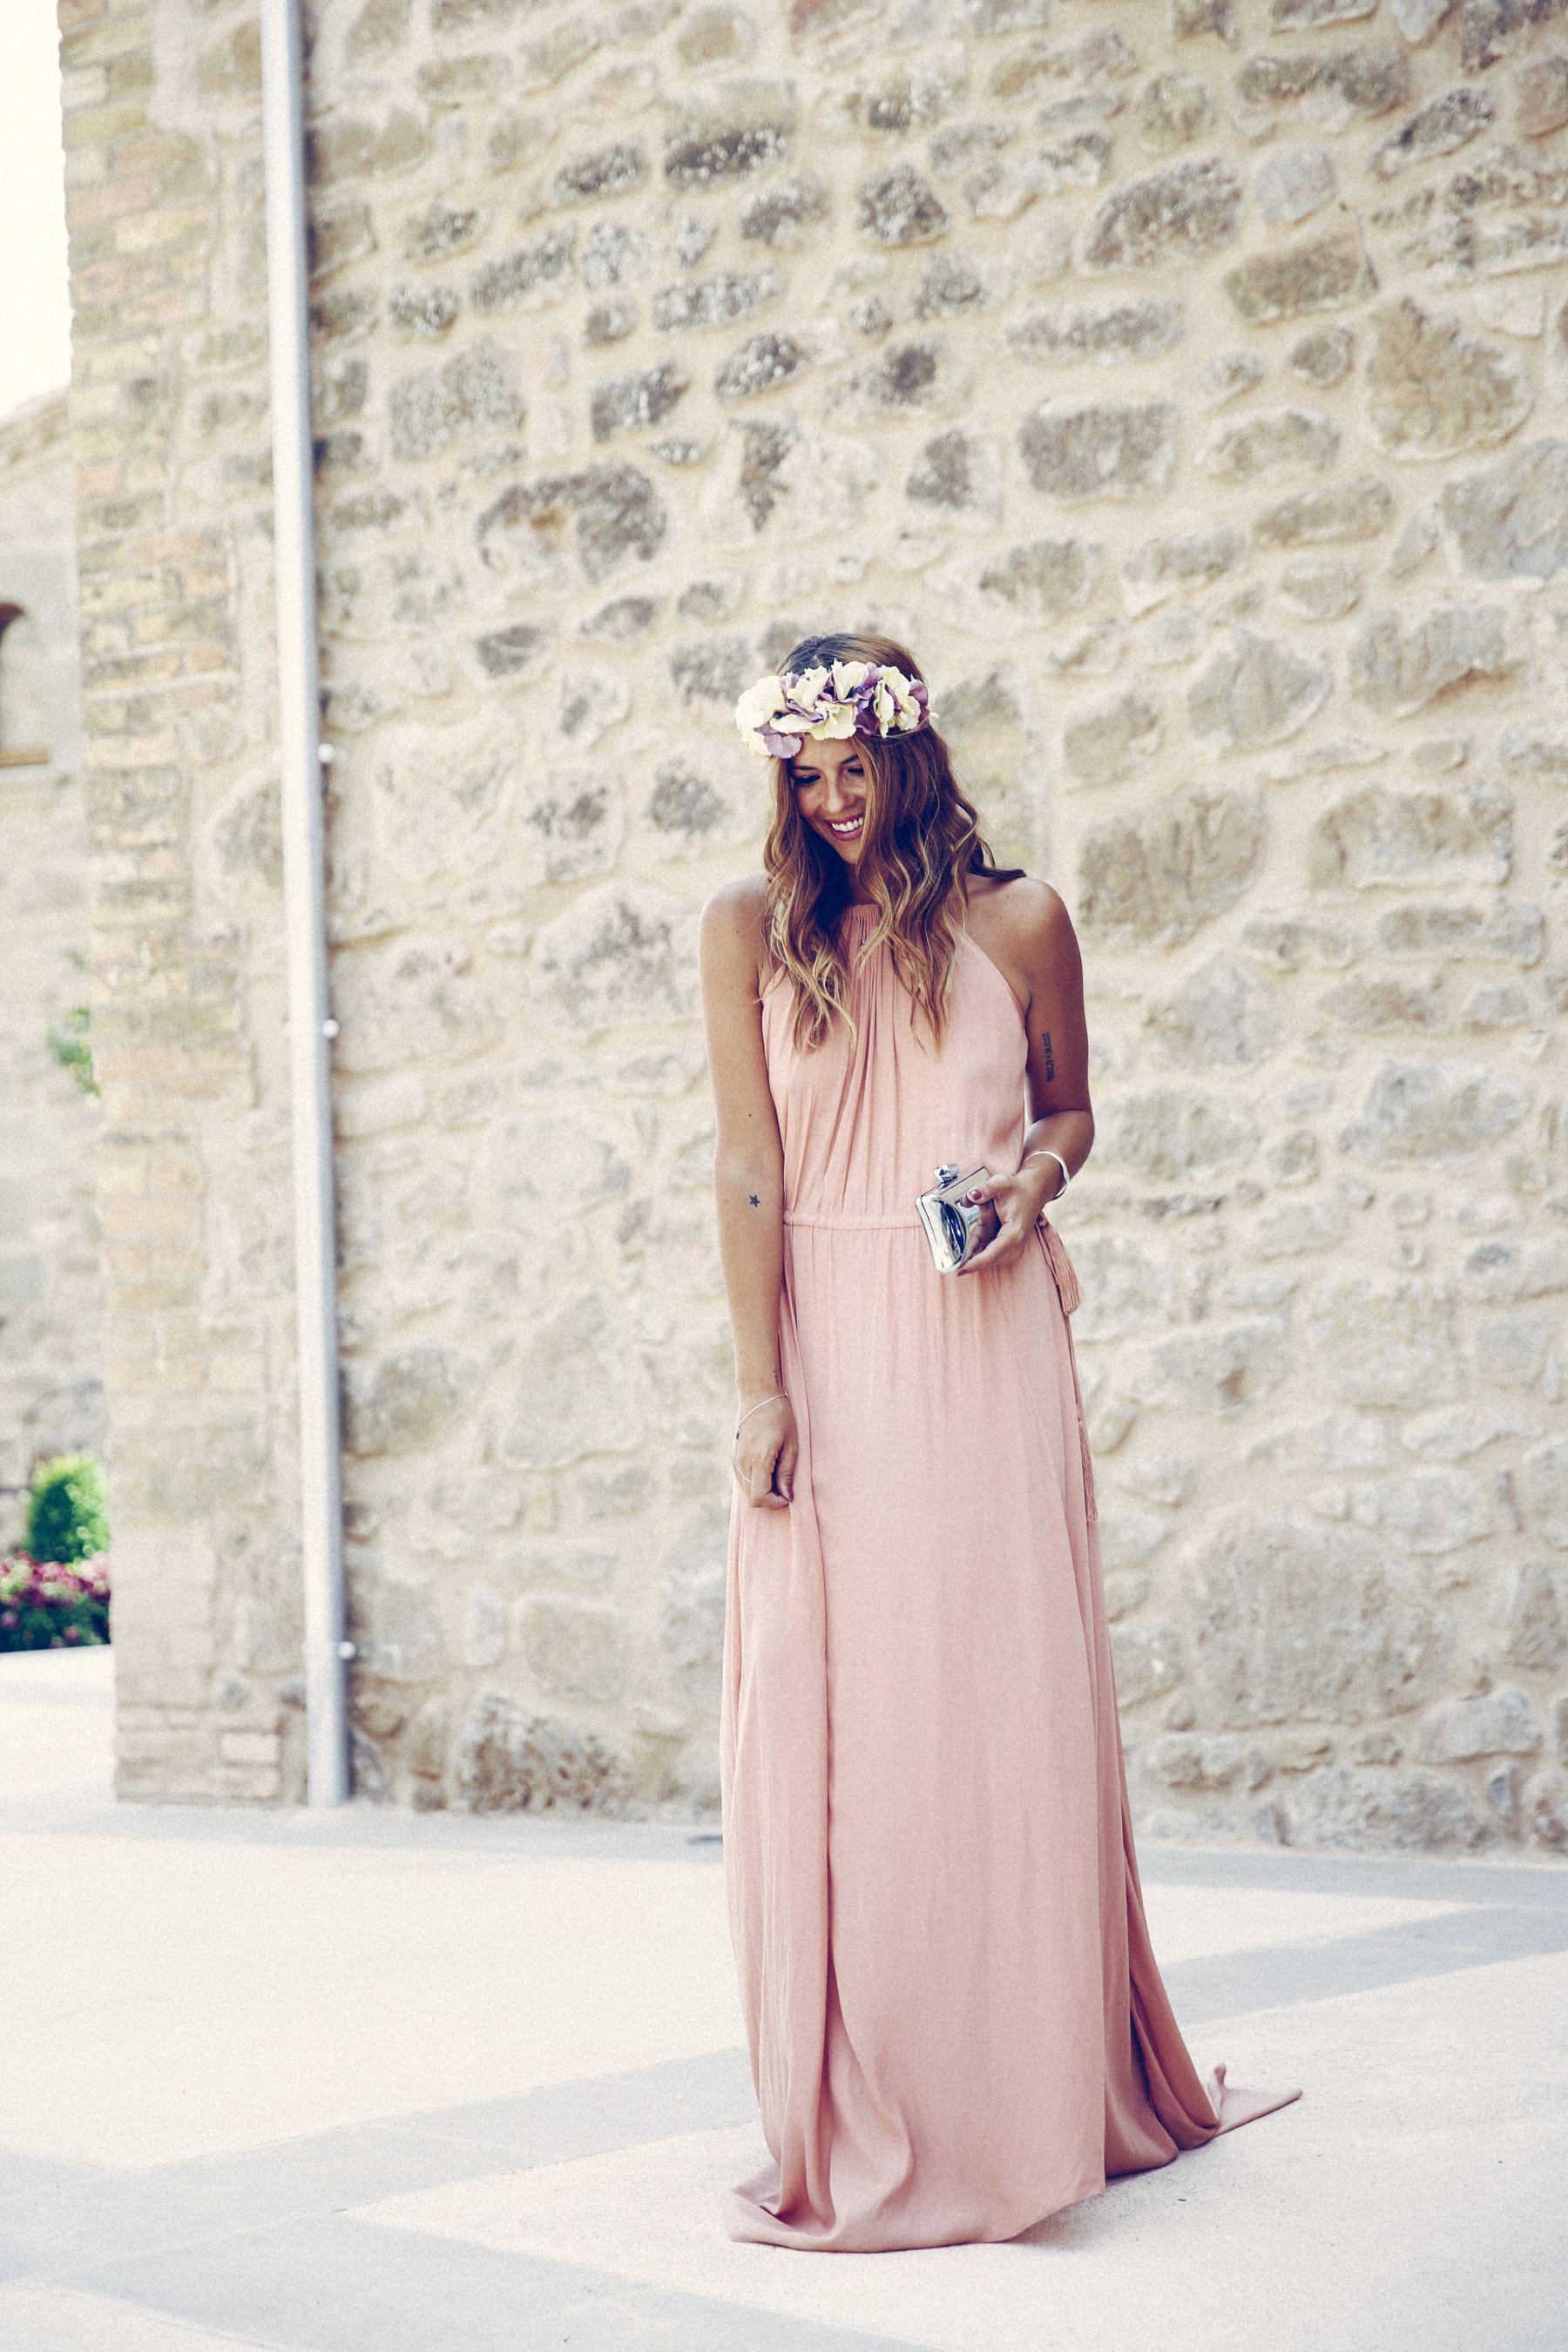 ea977855b1720 adolfo dominguez dress vestido pura lopez sandalias sandals wedges corona  flores flower crown pink silver rosa plata clutch bombonera summer boda  wedding ...